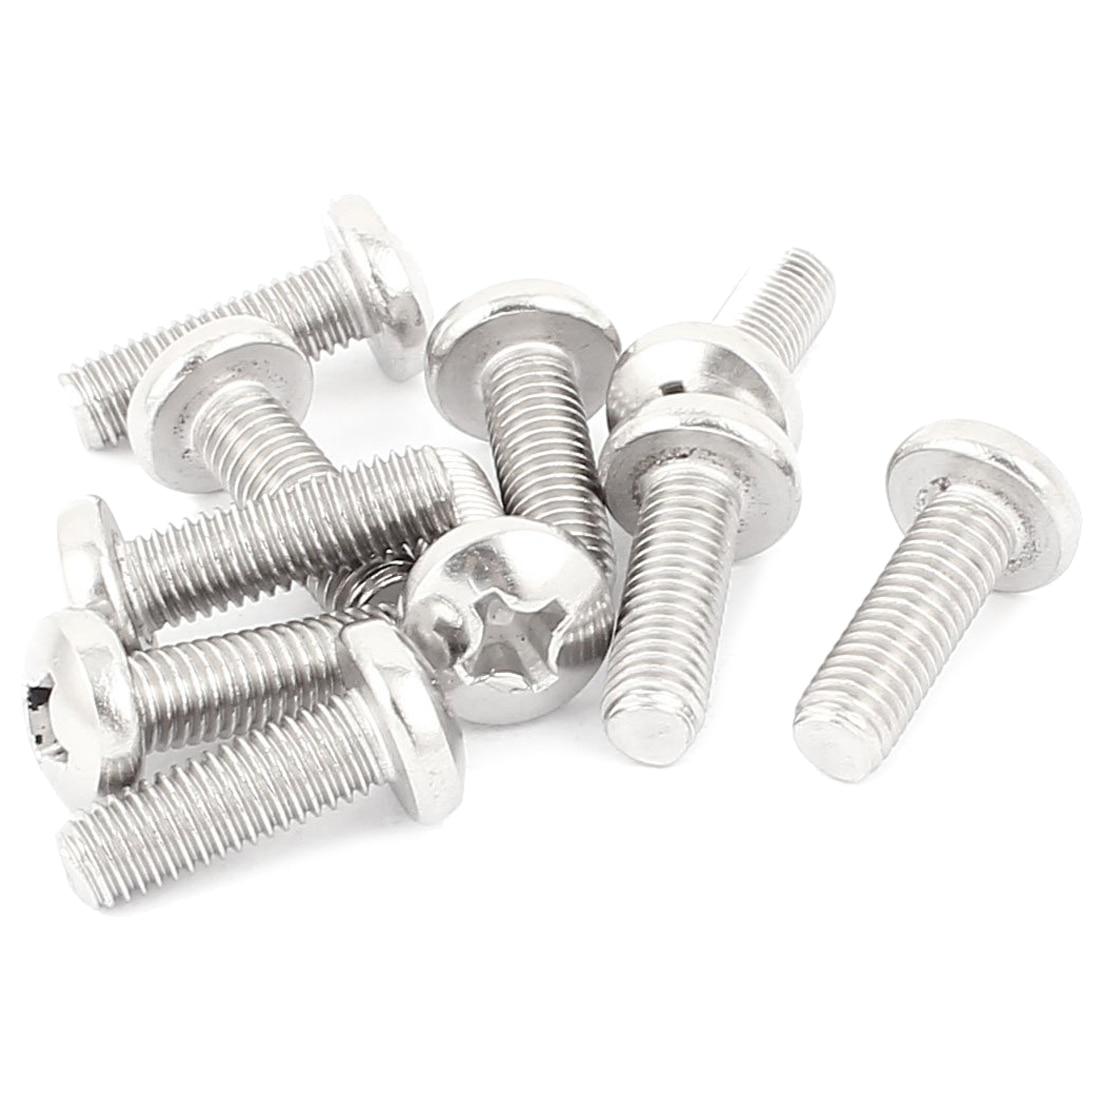 TV to Wall Mount Bracket M8 Thread Round Phillips Screws Bolts 10pcs universal aluminum internal thread round servo mount bracket silver